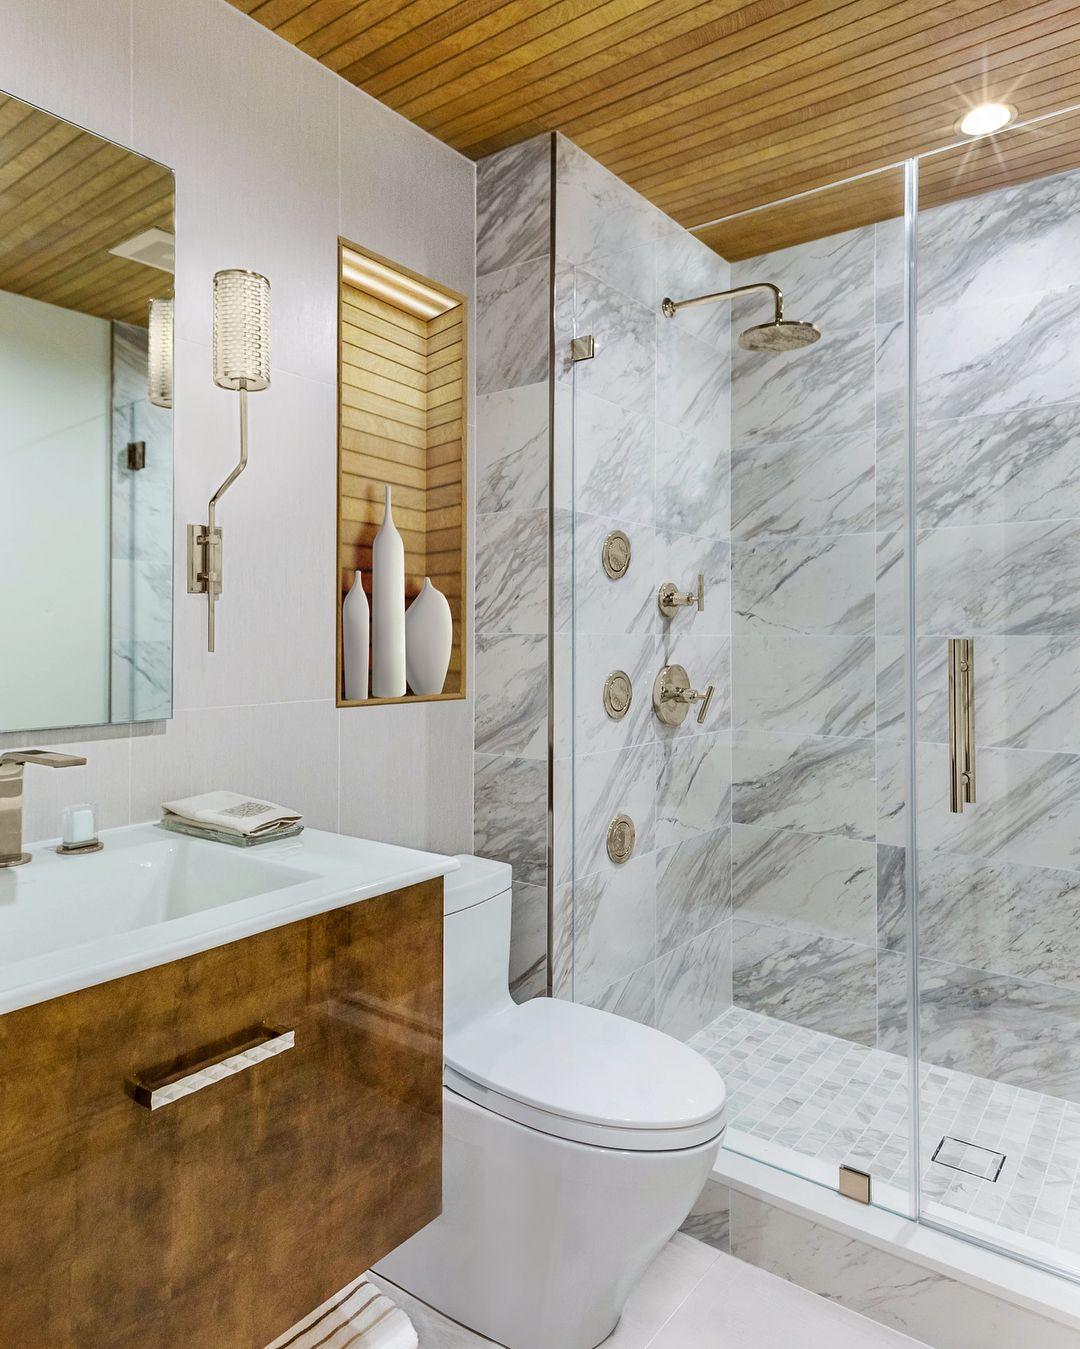 80 Best Small Bathroom Design Ideas For Inspiration Your Solution Bathroom Smallbath Rustic Bathroom Vanities Bathroom Design Small Bathroom Interior Design